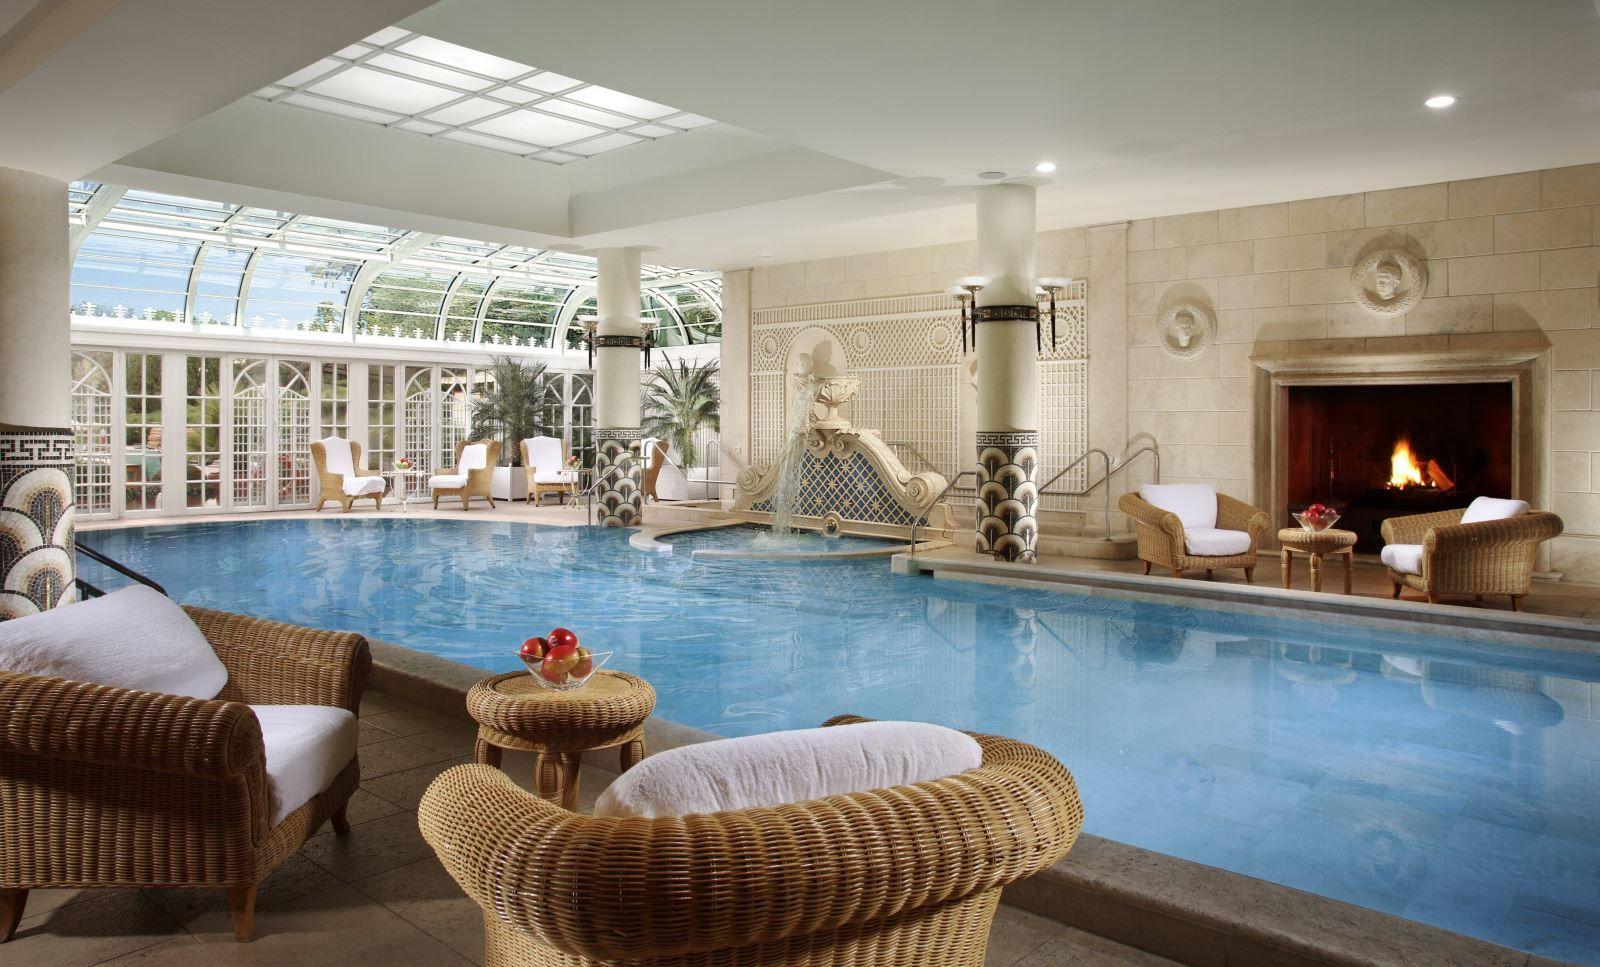 Grand Spa Indoor Pool Luxury Swimming Pools Indoor Swimming Pools